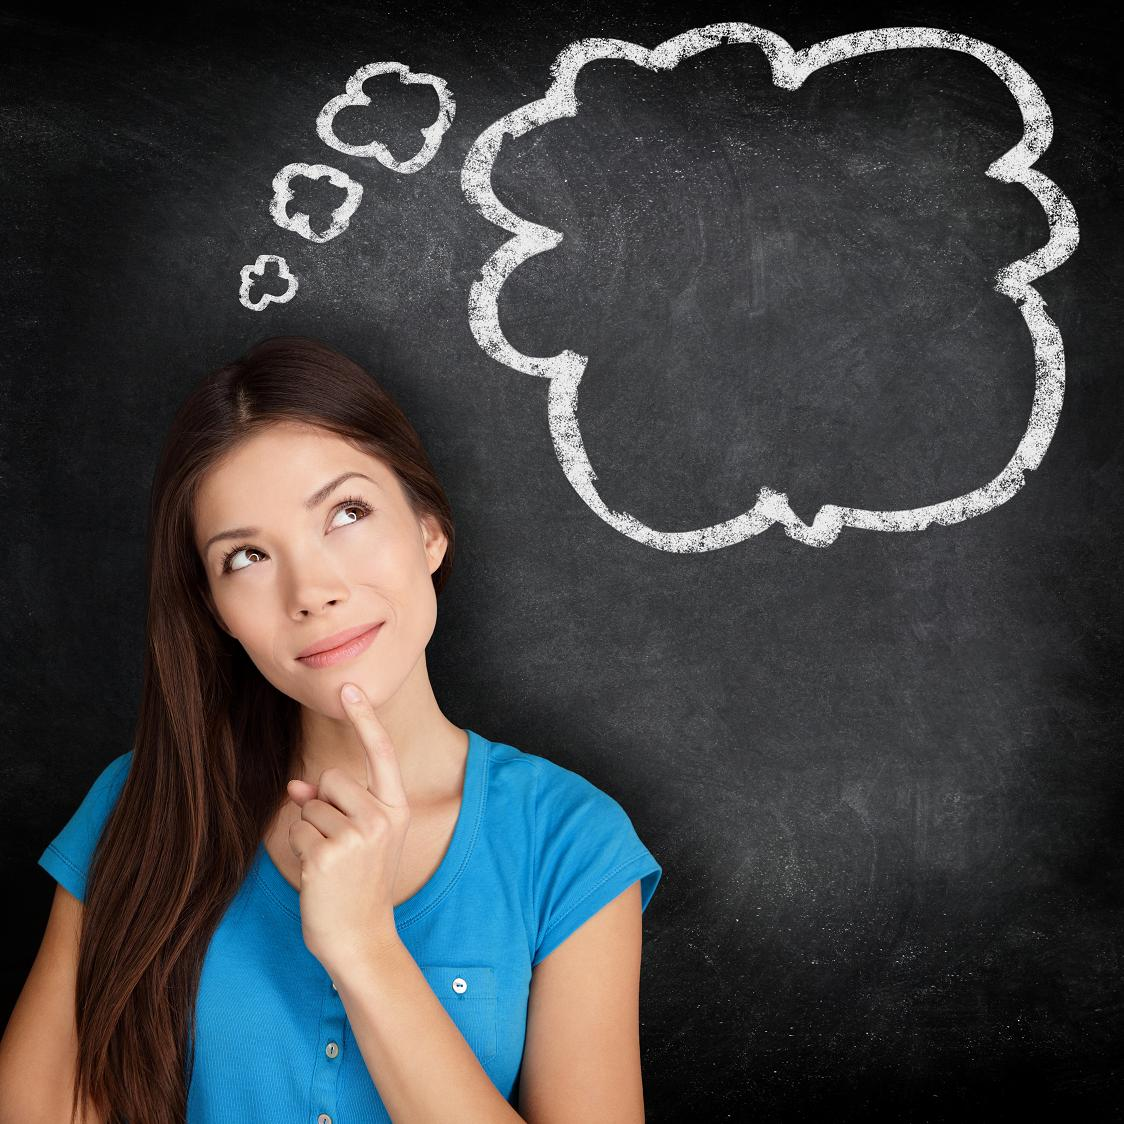 Woman-Thinking-Blackboard3.jpg